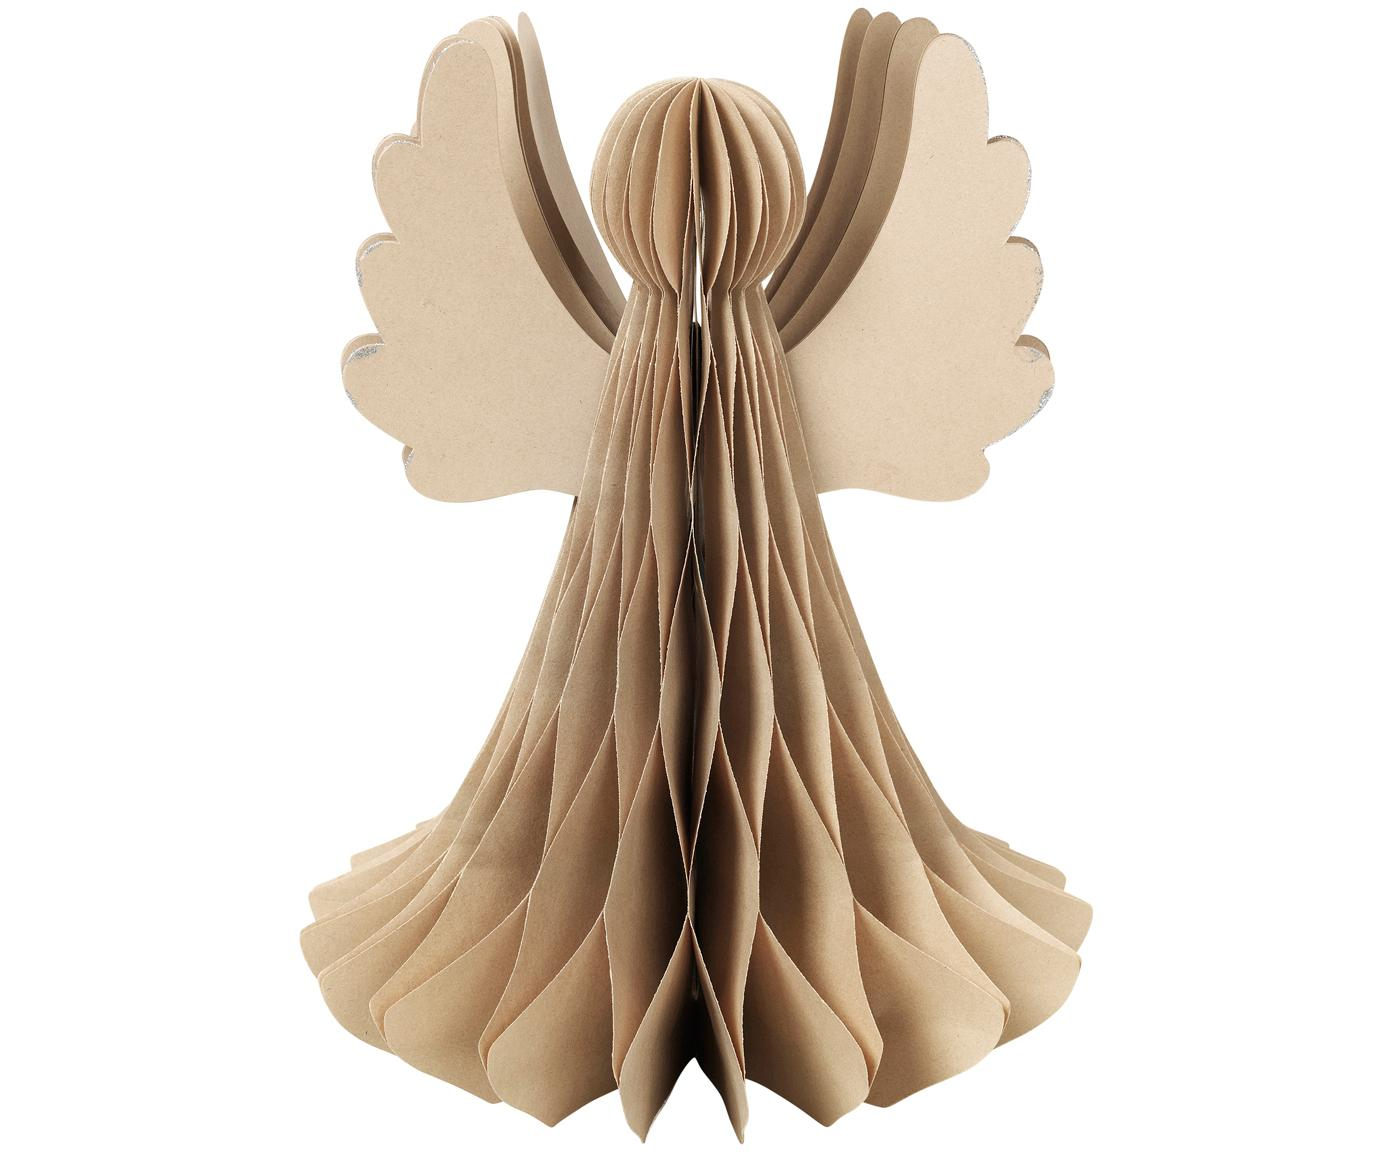 Pieza decorativa XL Angel, Papel, Beige, Ø 21 x Al 27 cm